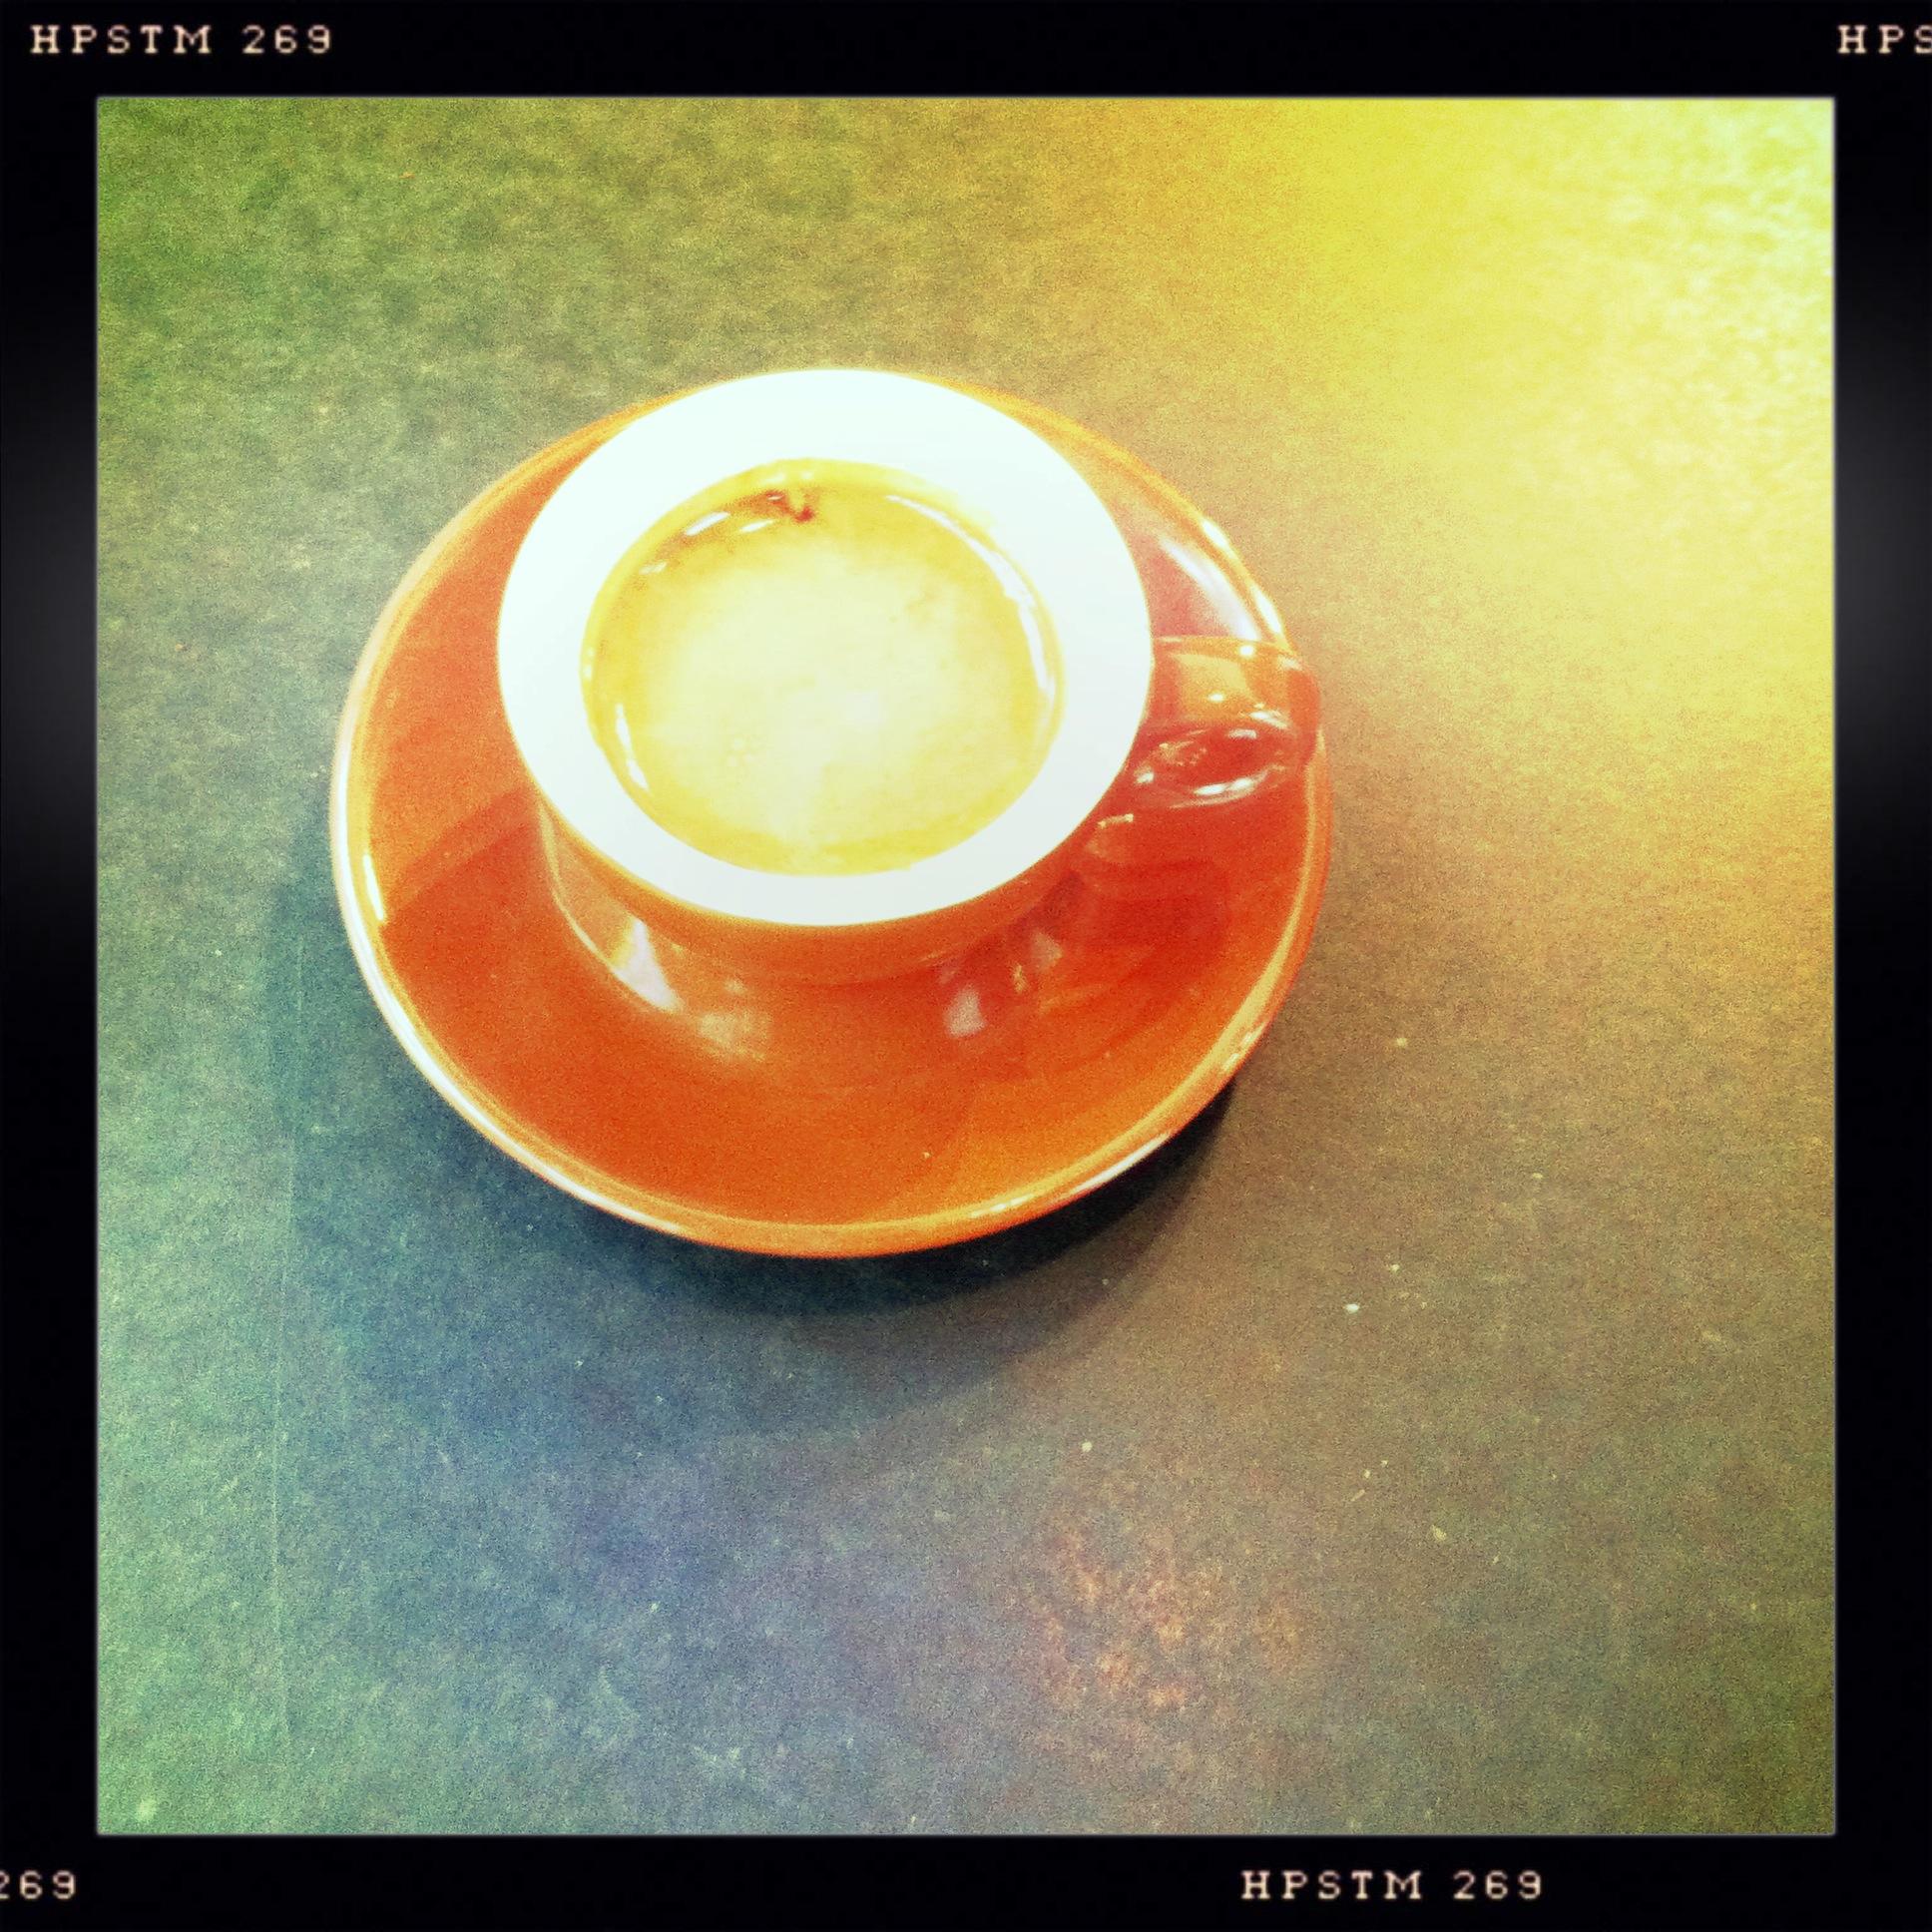 I like espresso...